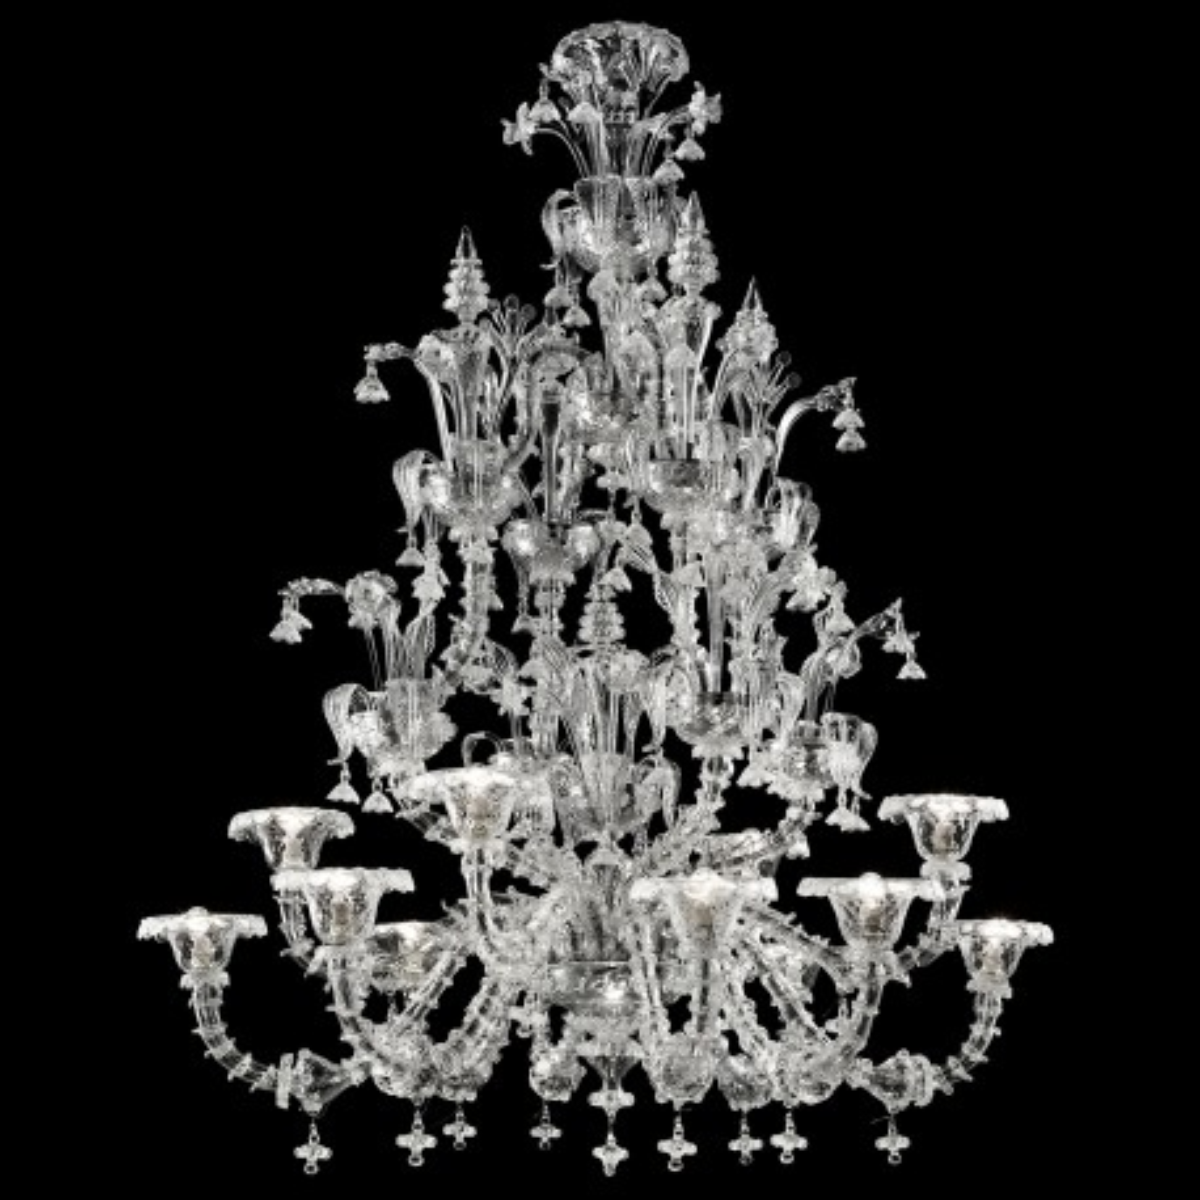 """Ginevra"" Murano glas Kronleuchter - 8+4 flammig - transparent"